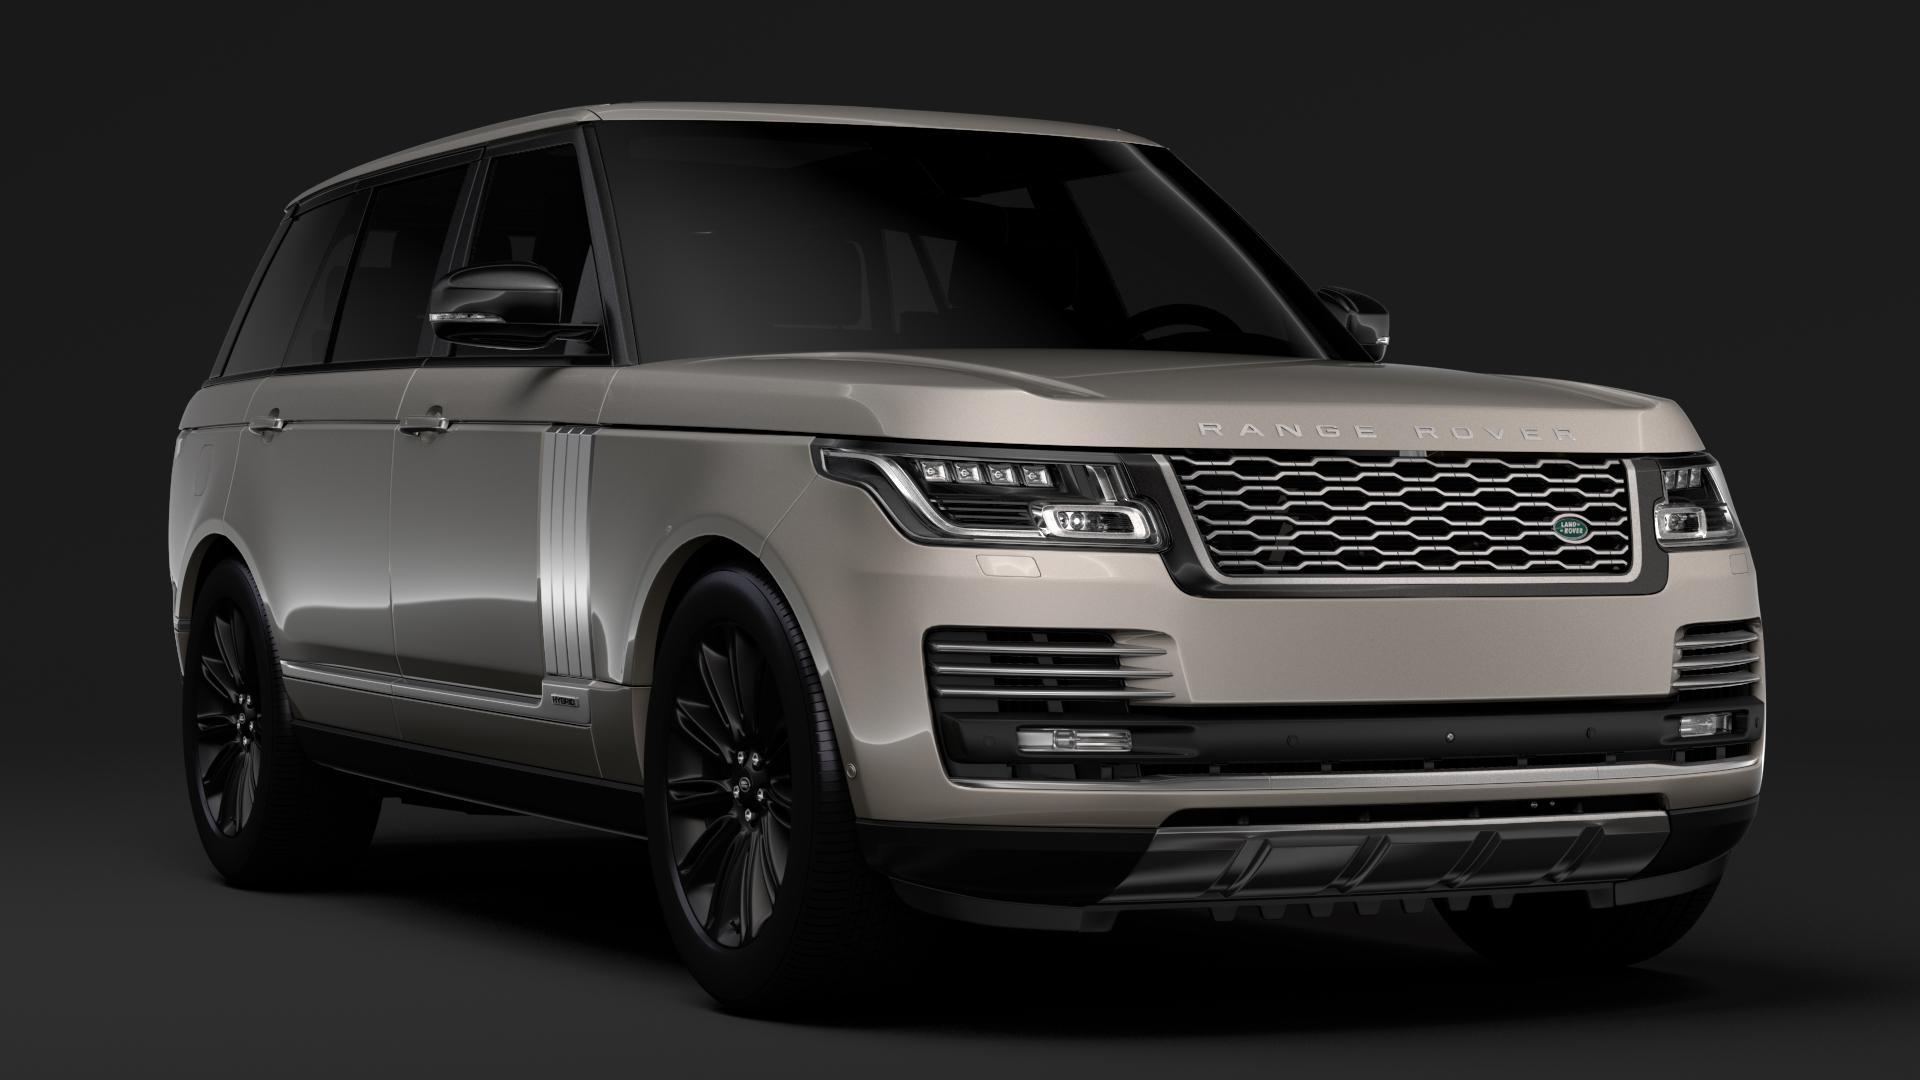 range rover autobiography hybrid lwb l405 2018 3d model max fbx c4d lwo ma mb hrc xsi obj 277295